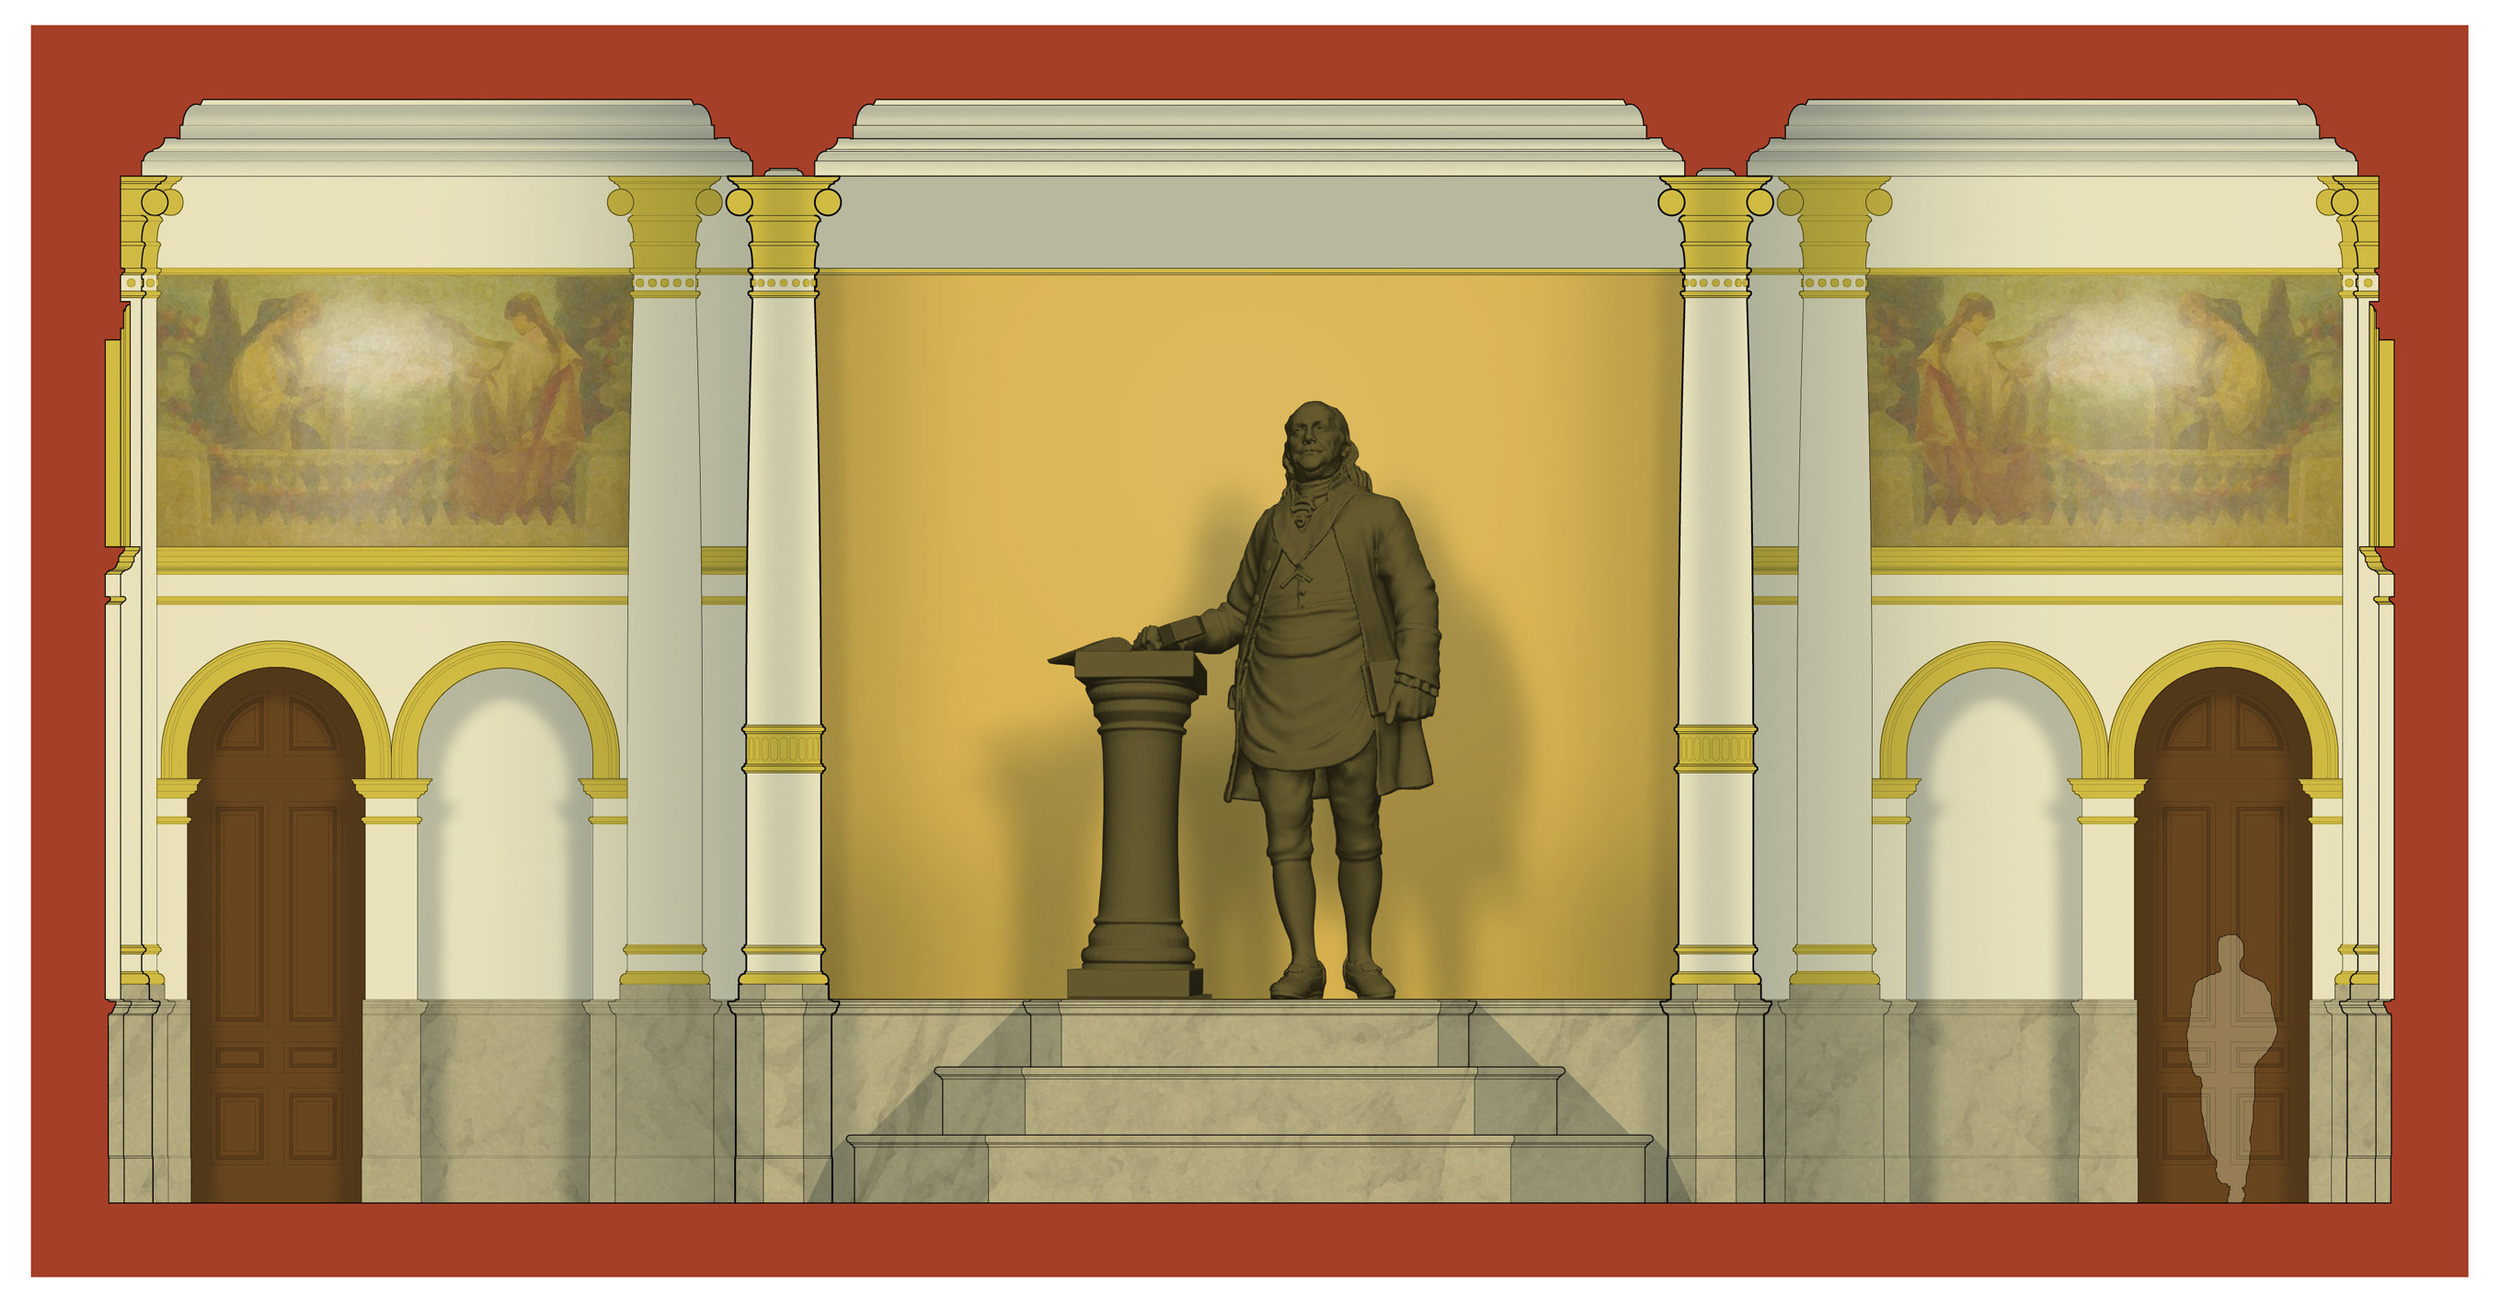 statue elevation